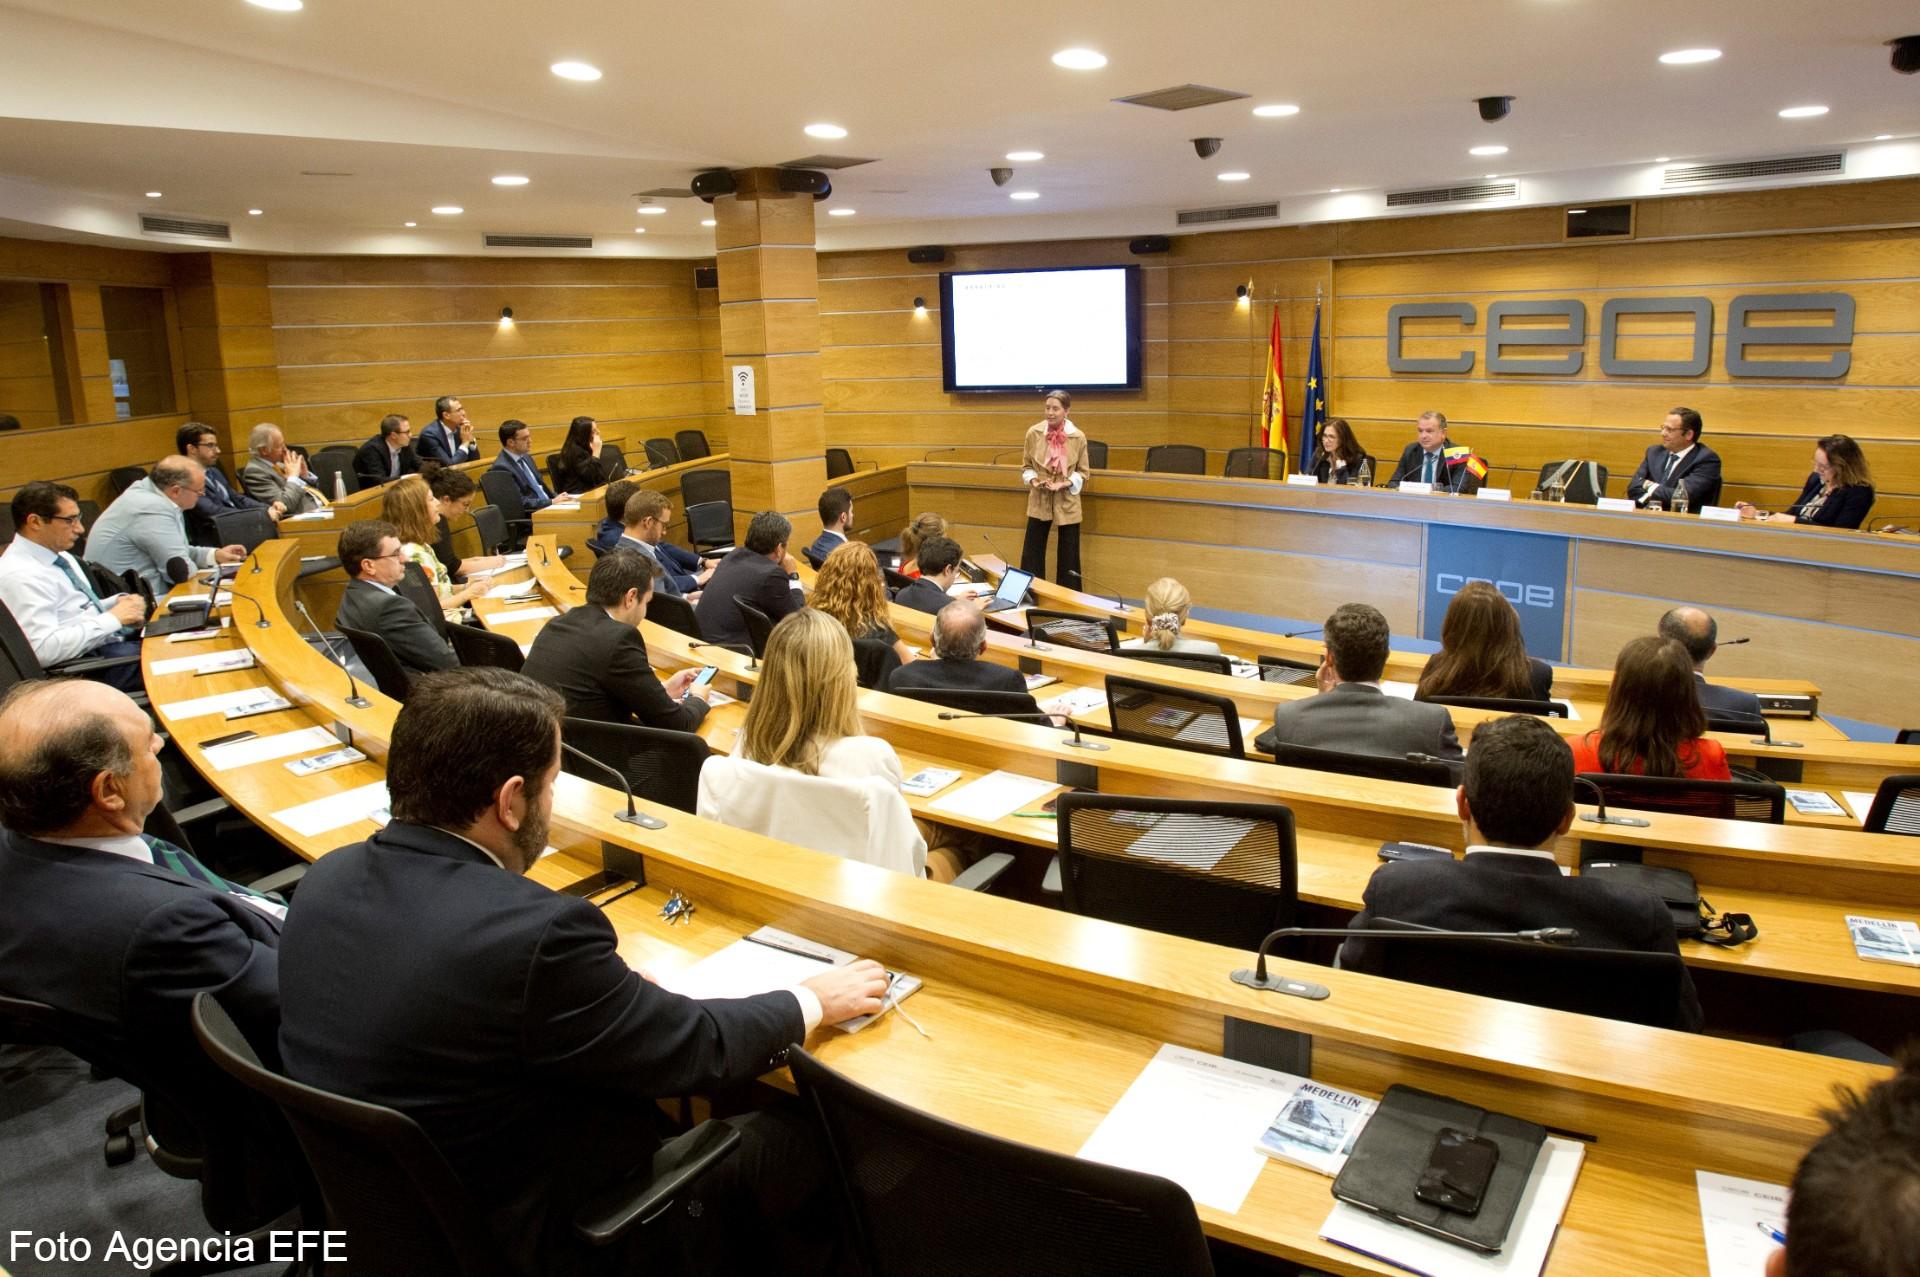 aci-madrid-5-agencia-efe